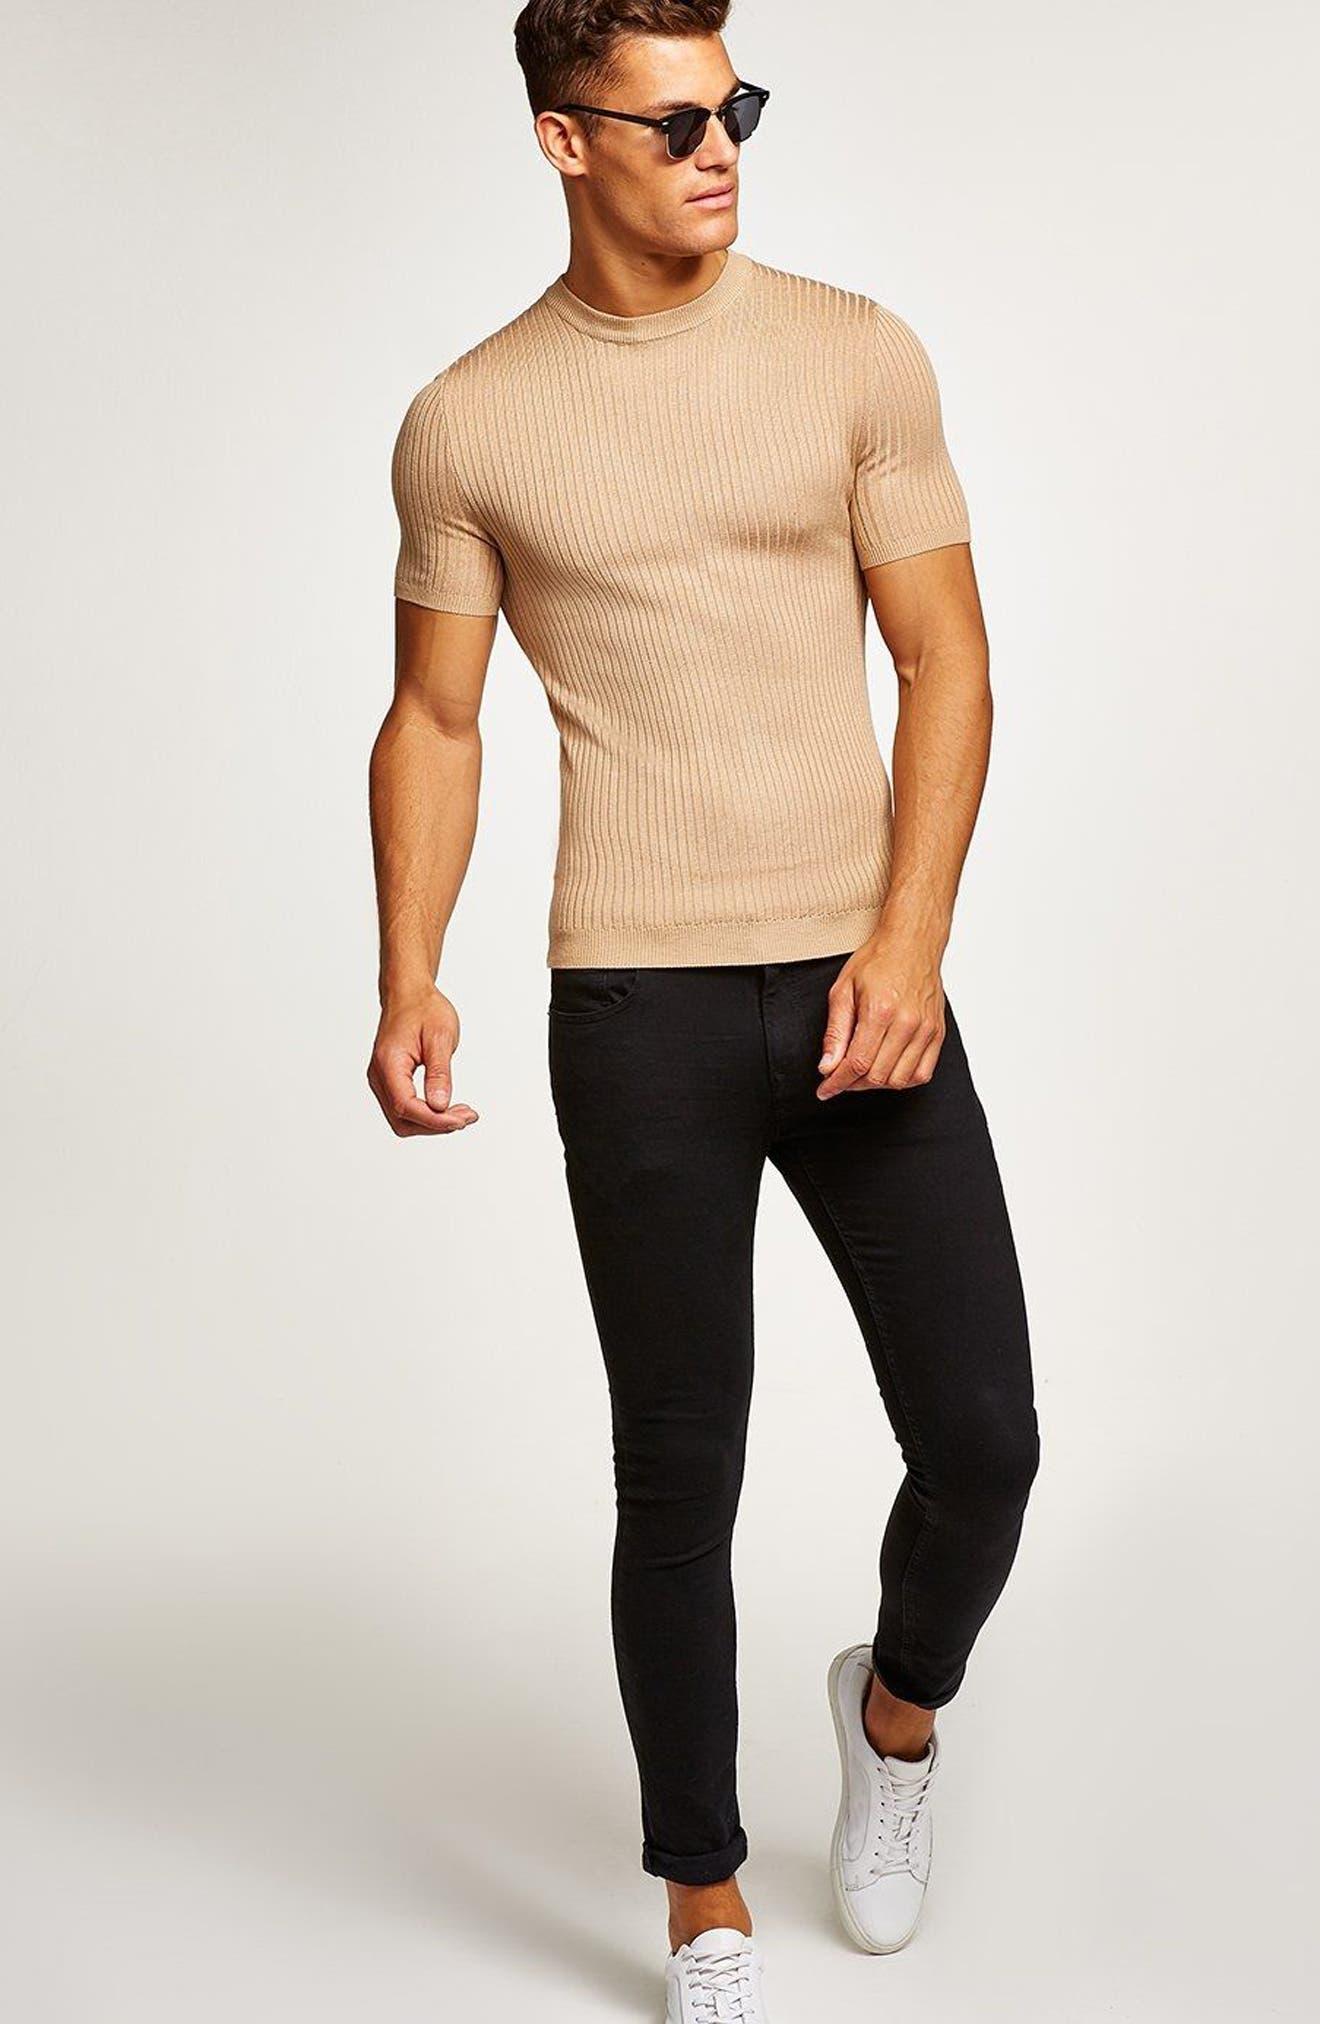 TOPMAN,                             Short Sleeve Muscle Fit Shirt,                             Alternate thumbnail 5, color,                             250